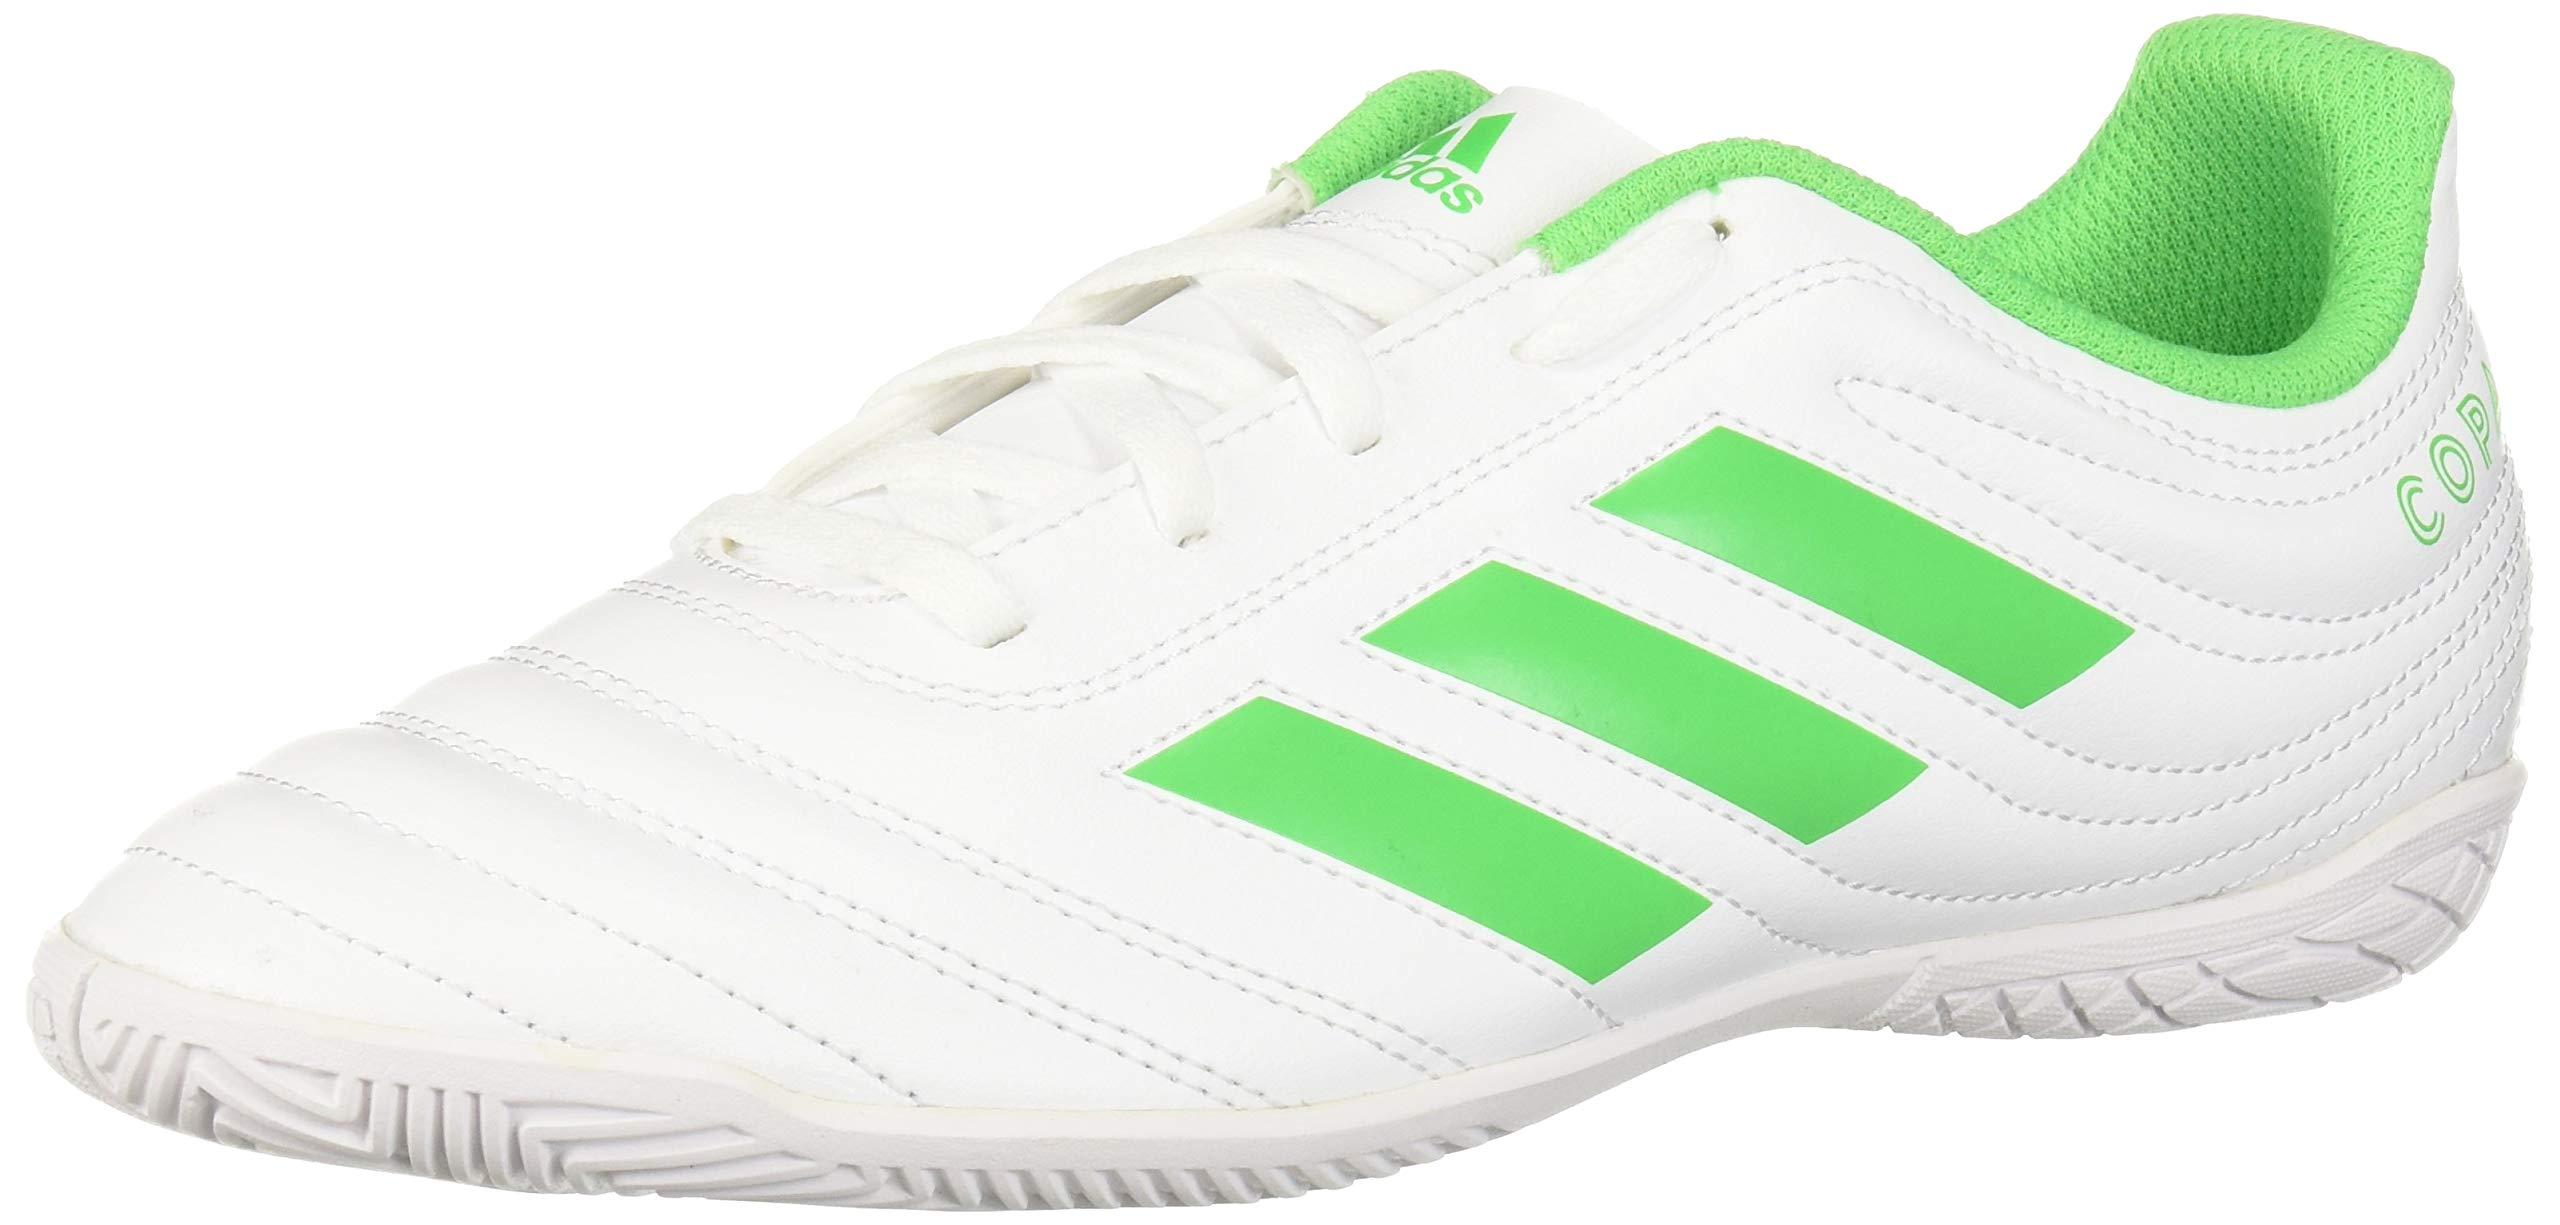 adidas Unisex Copa 19.4 Indoor Soccer Shoe White/Solar Lime/White, 3 M US Little Kid